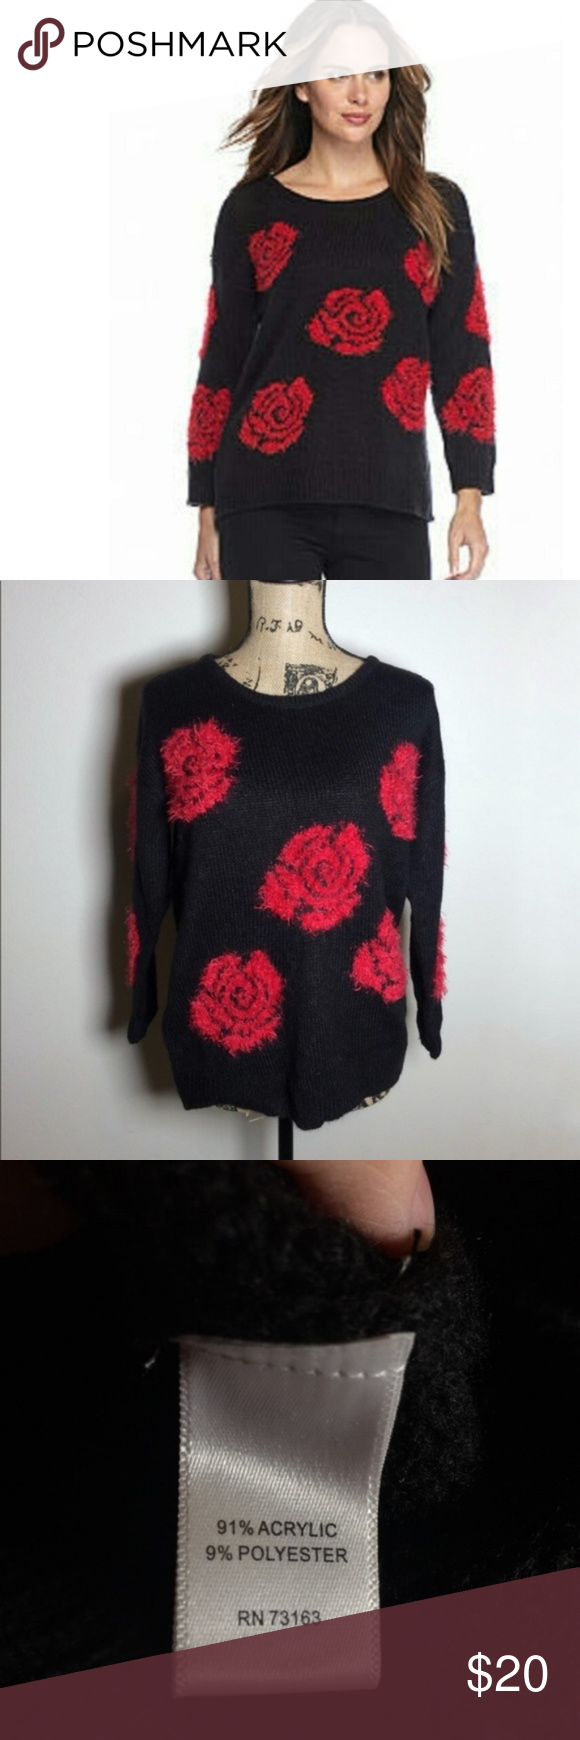 Cable Gauge Black Sweater Fuzzy Red Roses Medium My Posh Closet